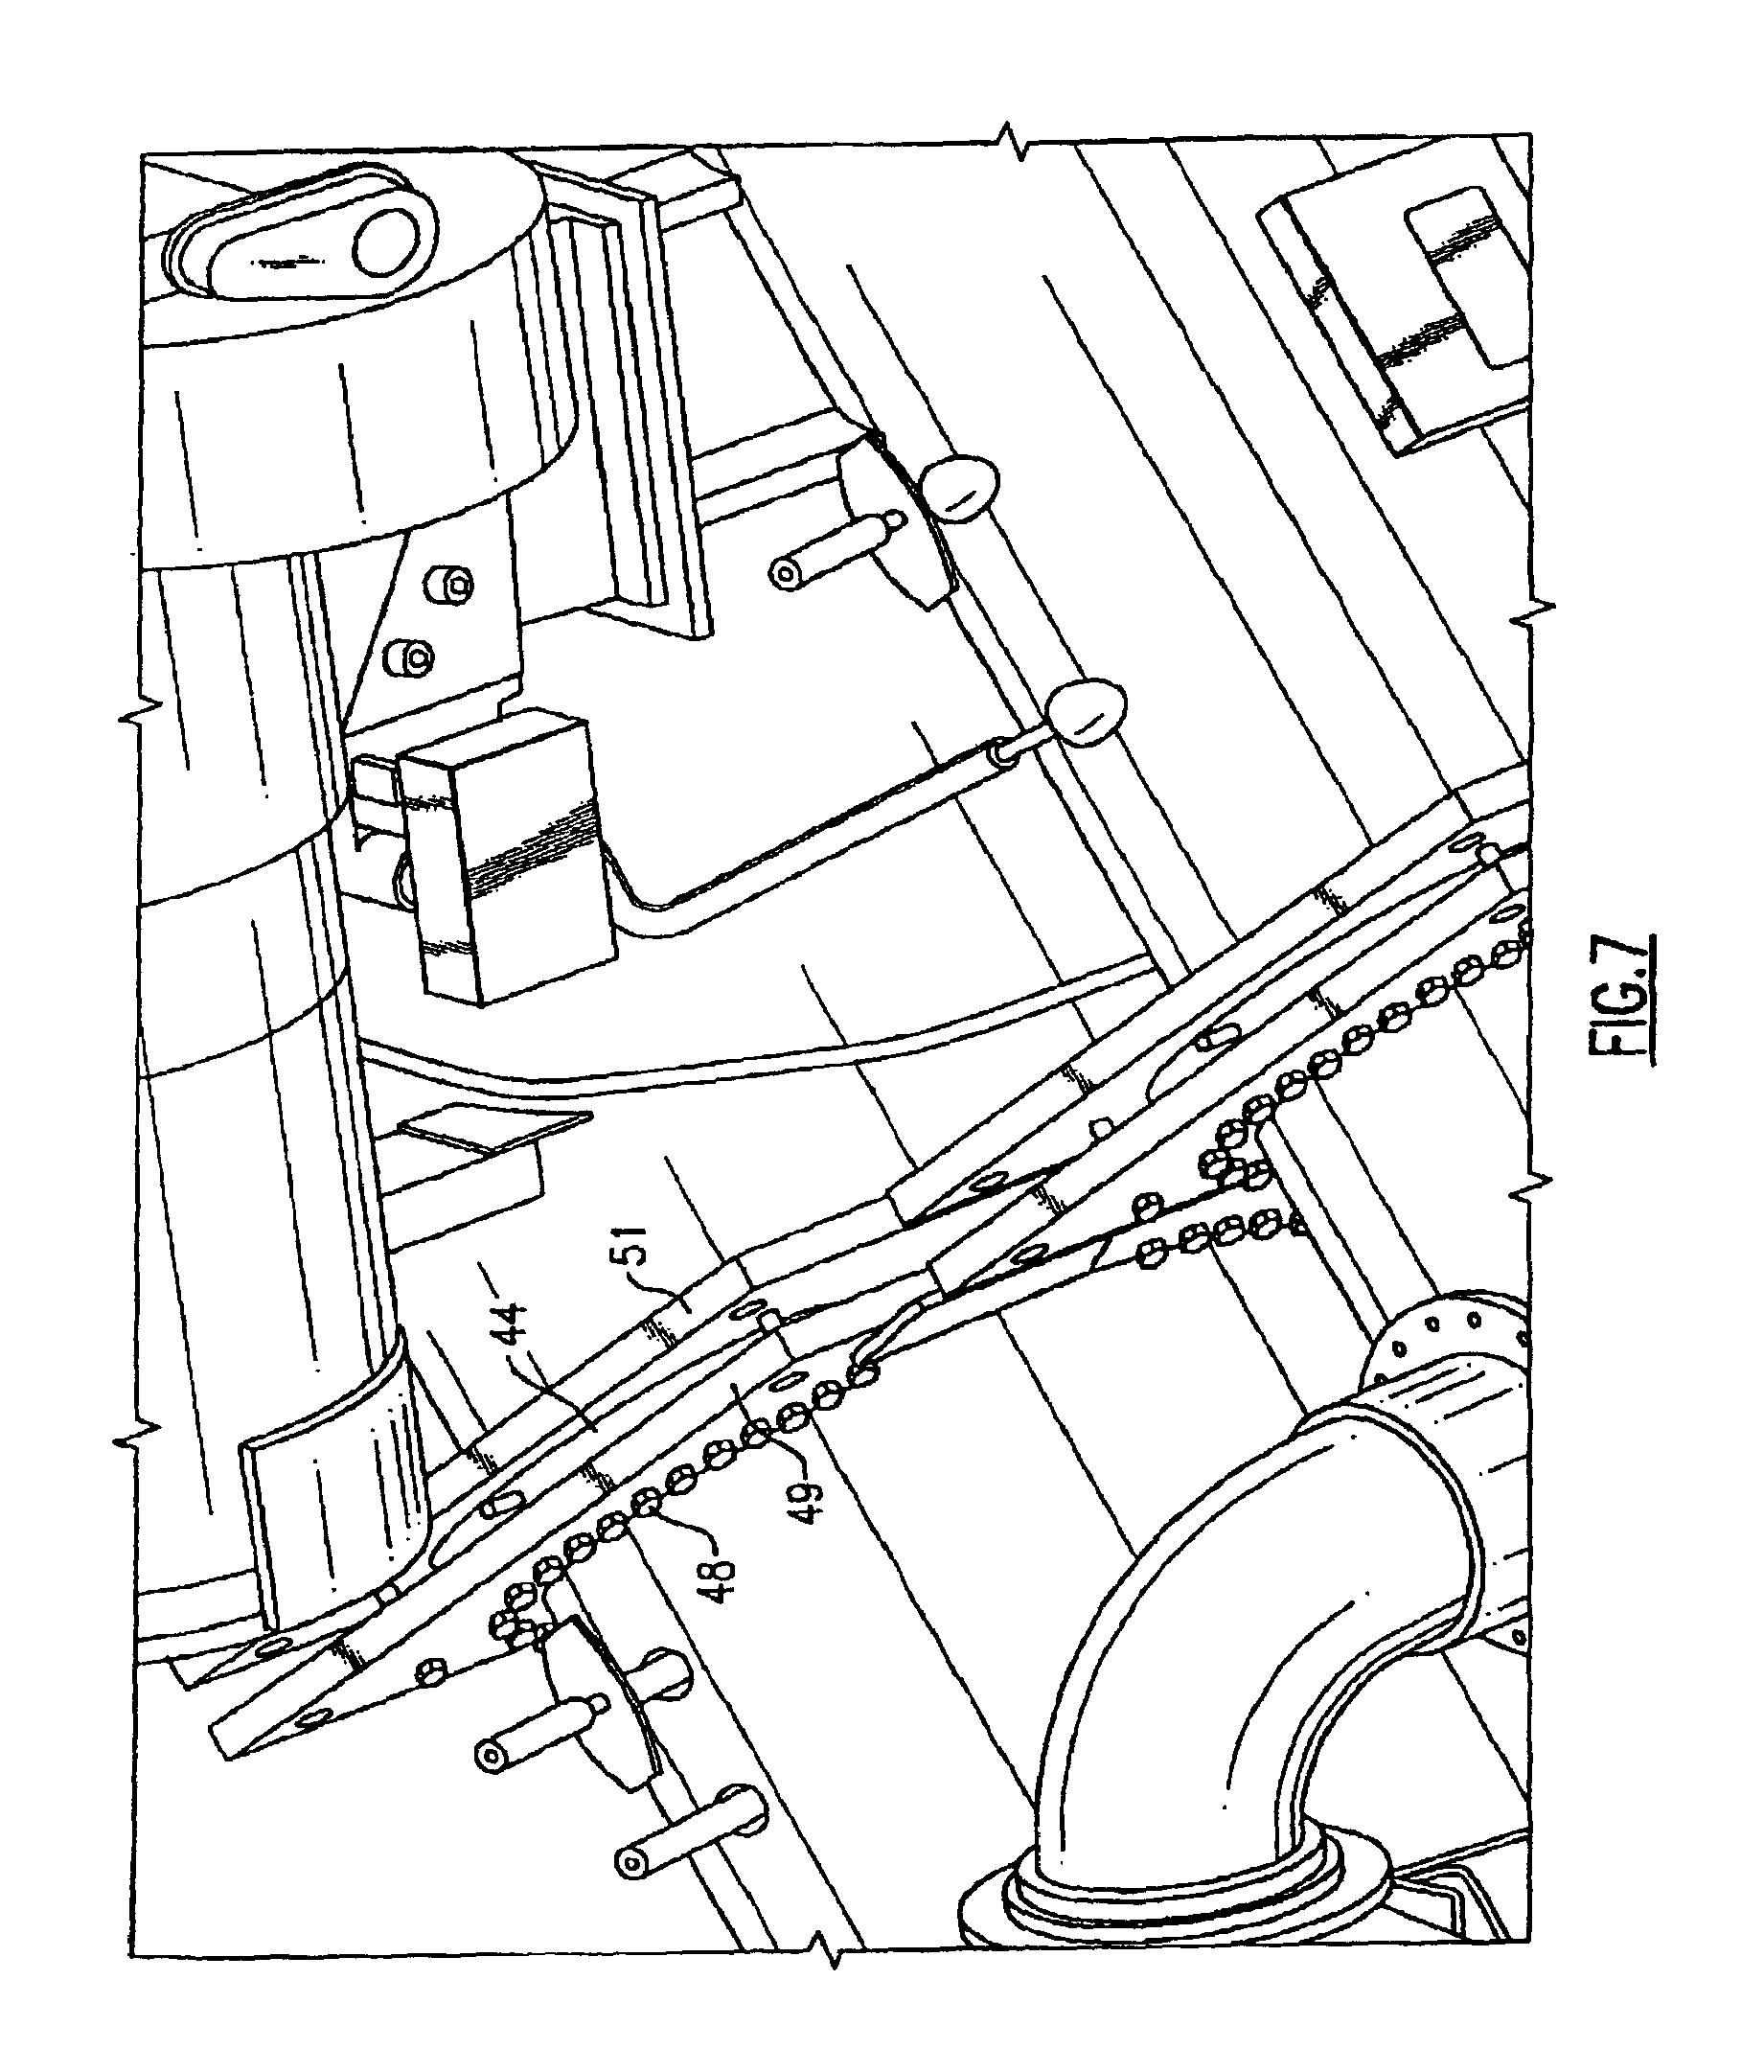 Clifford Matrix Alarm Wiring Diagram